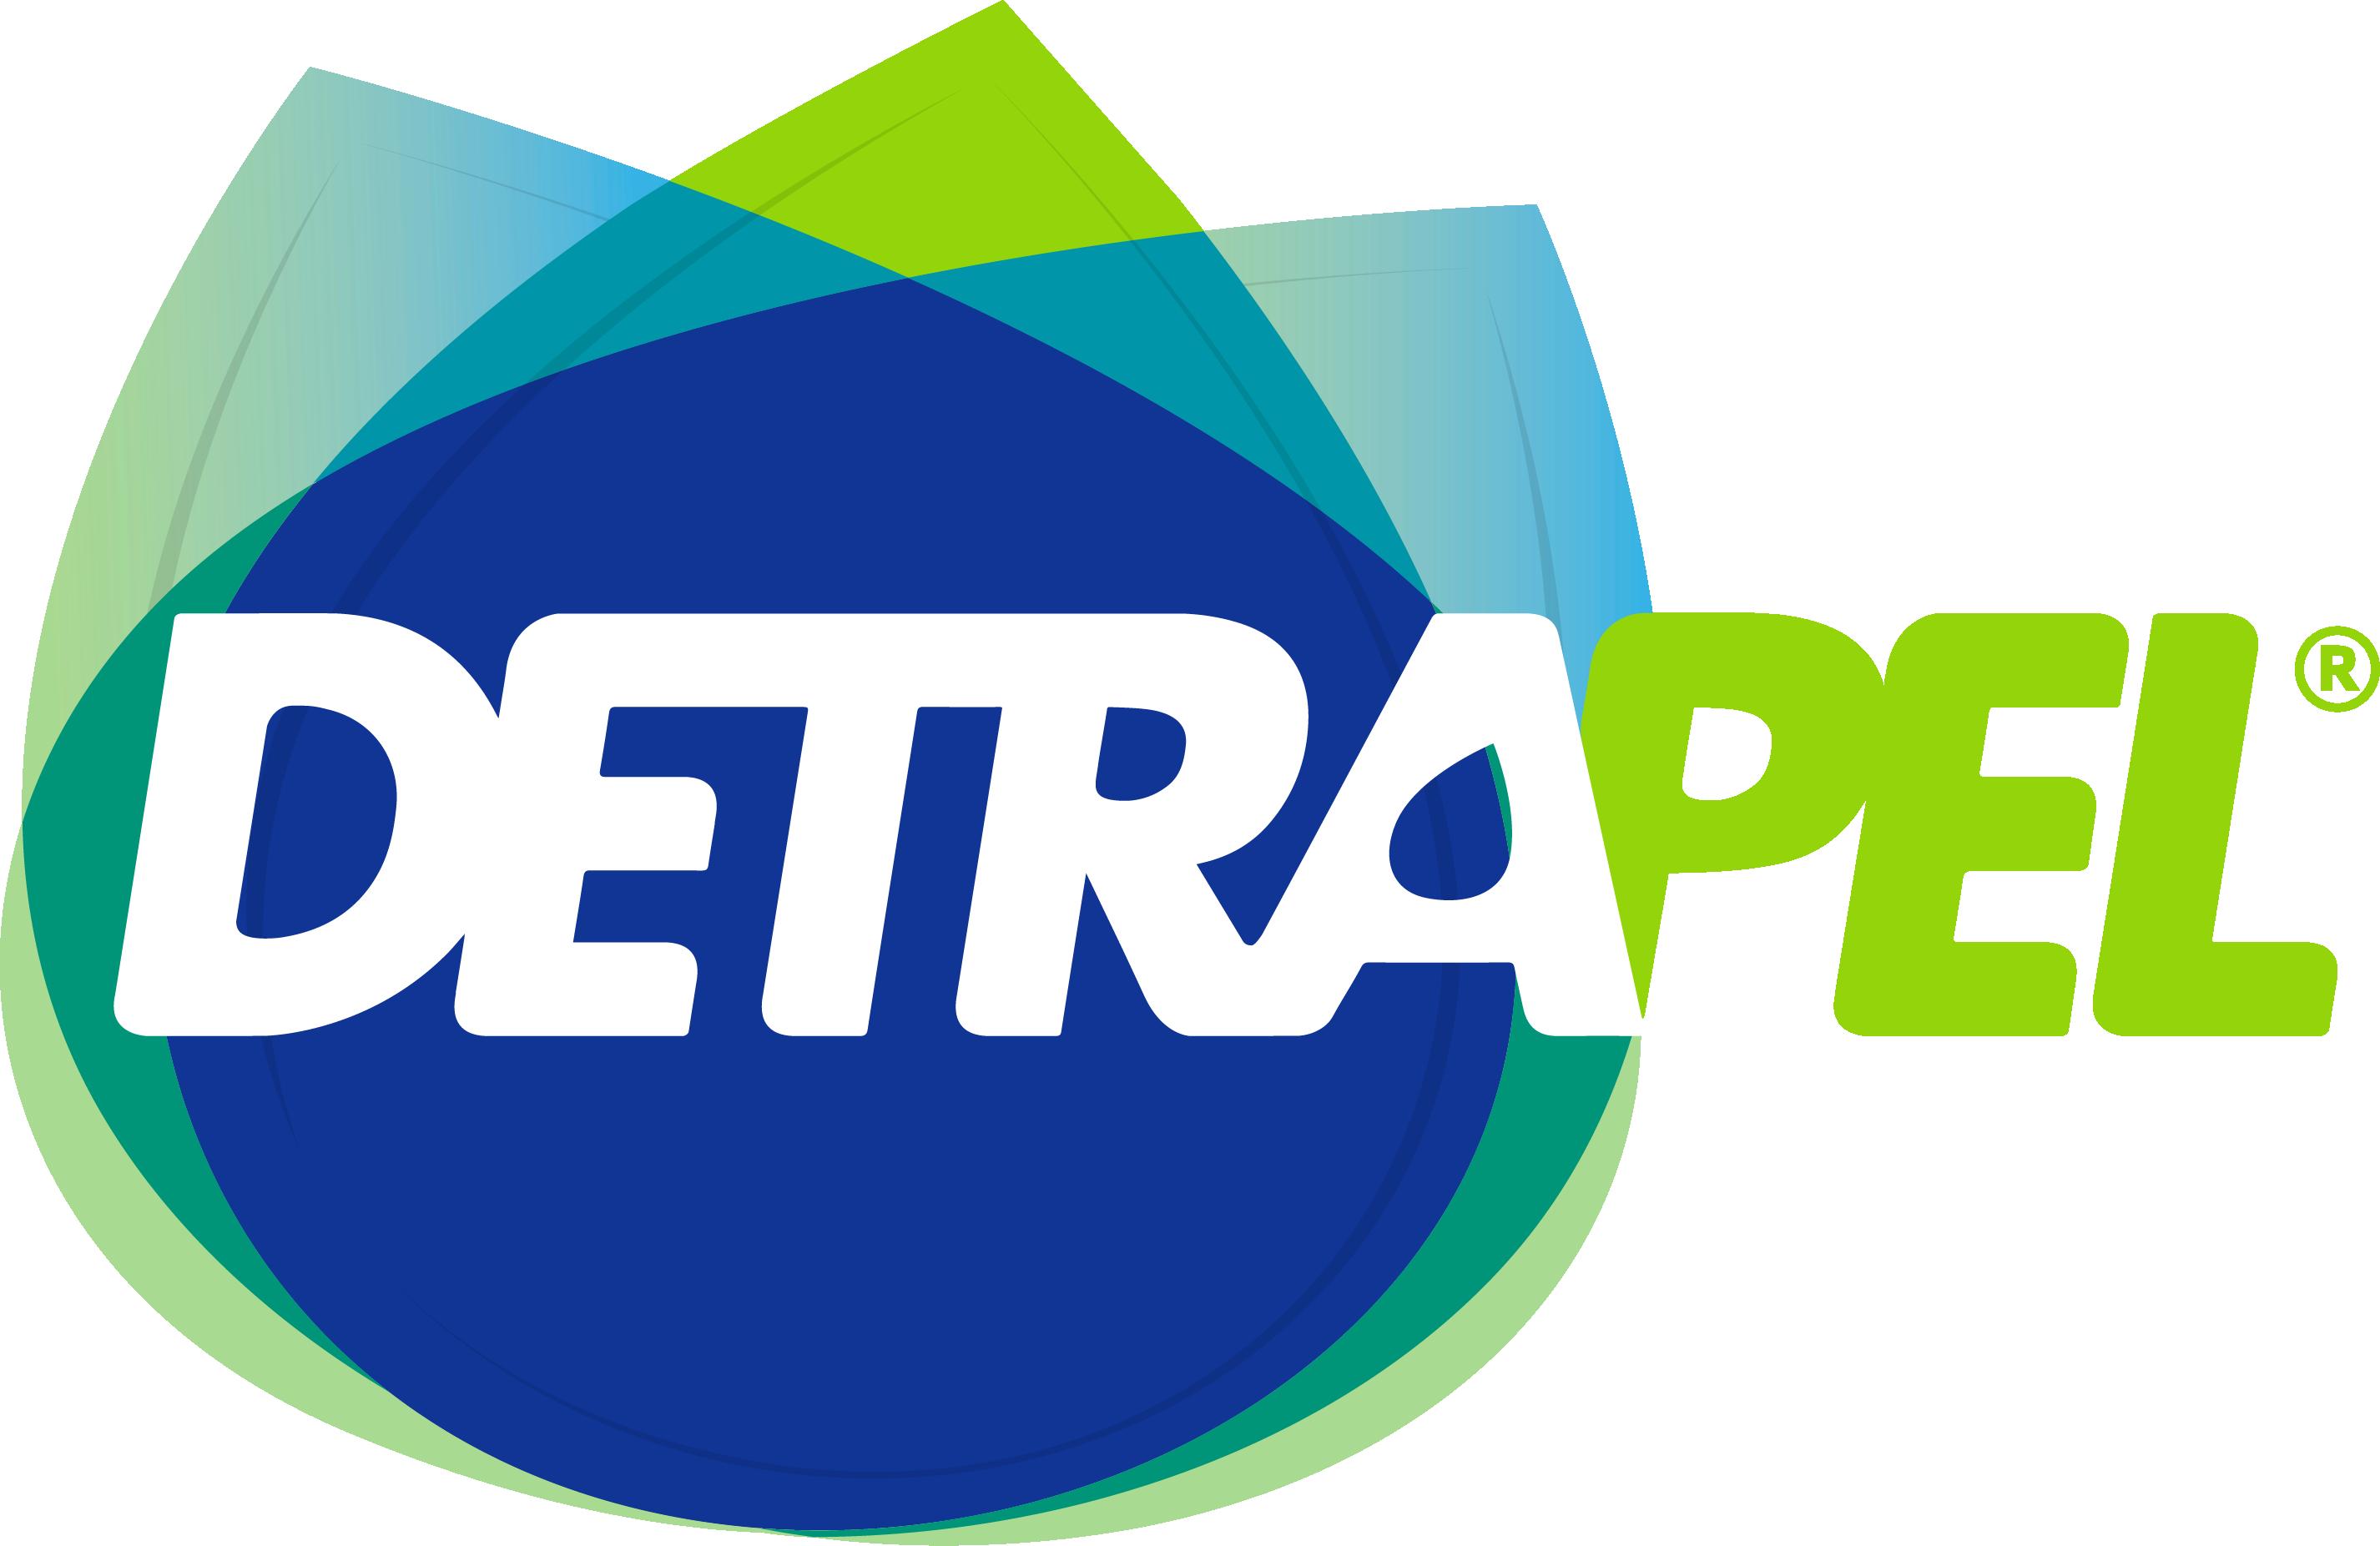 DetraPel|フッ素不使用 アメリカで大人気の凄い超撥水スプレー